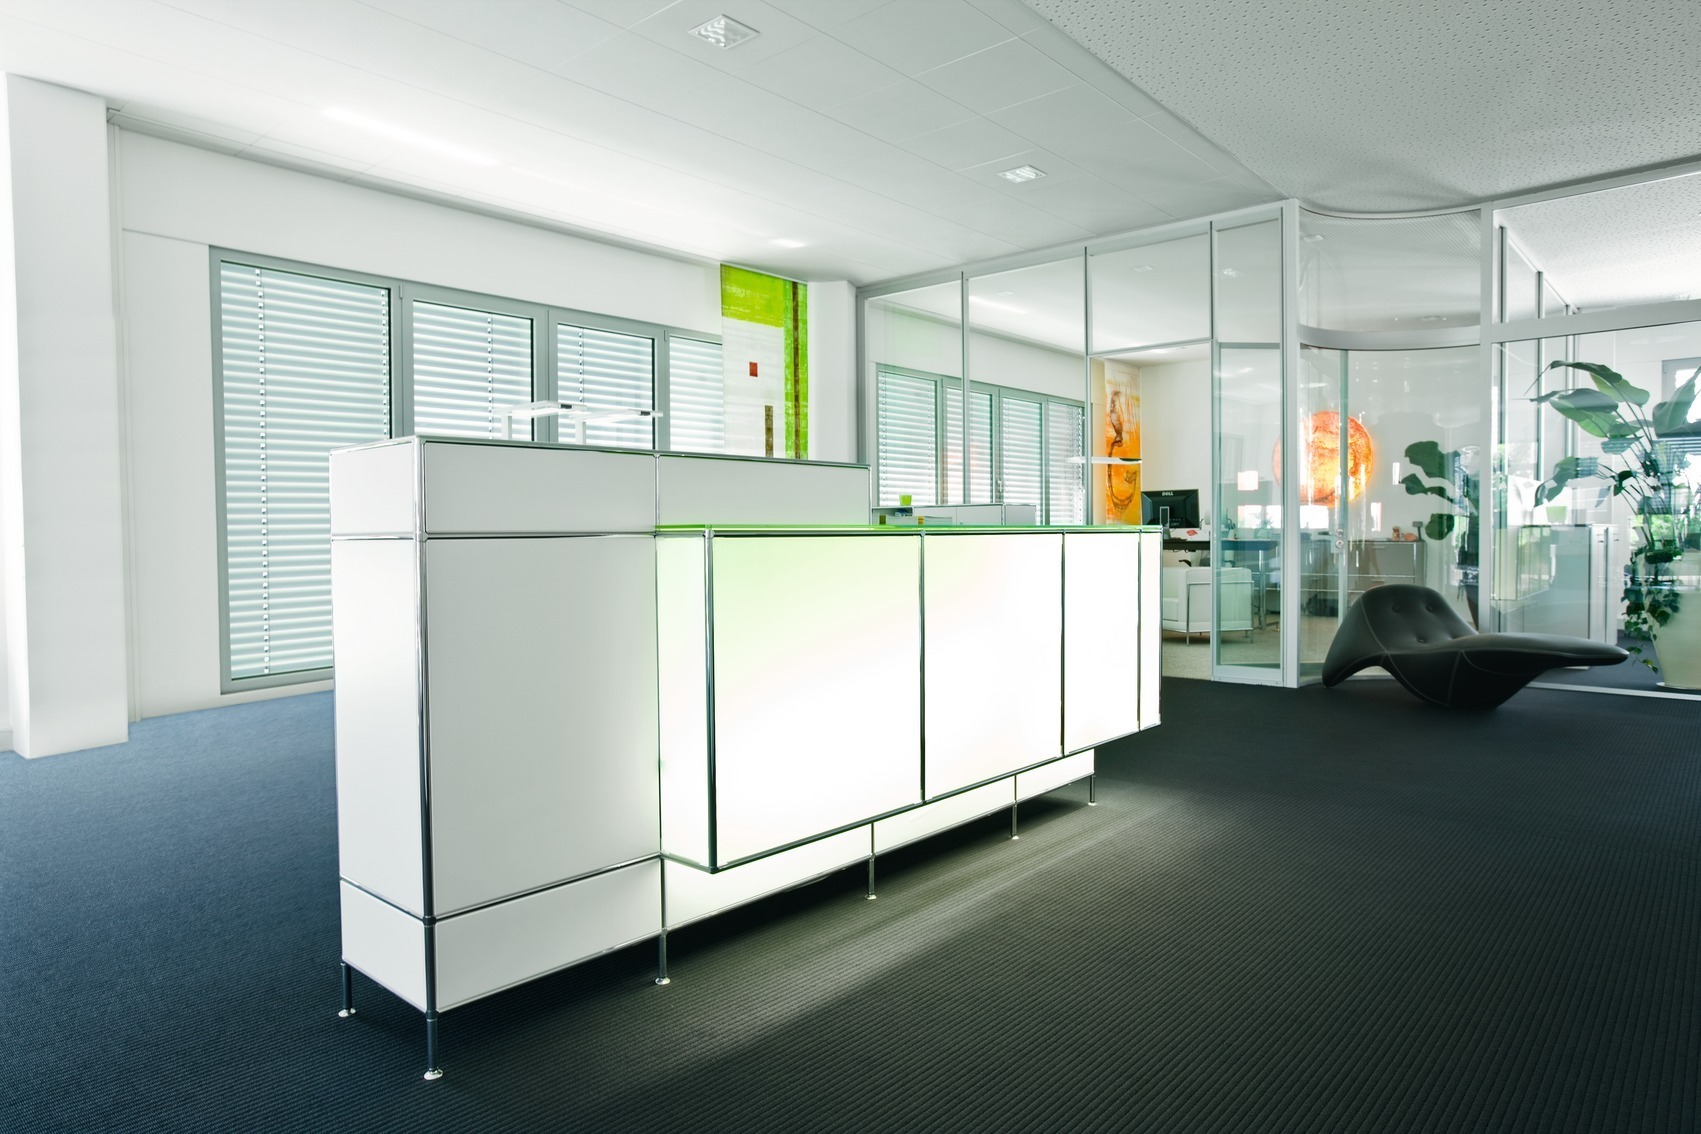 Büroeinrichtung empfang  BOSSE BÜROMÖBEL - Köln